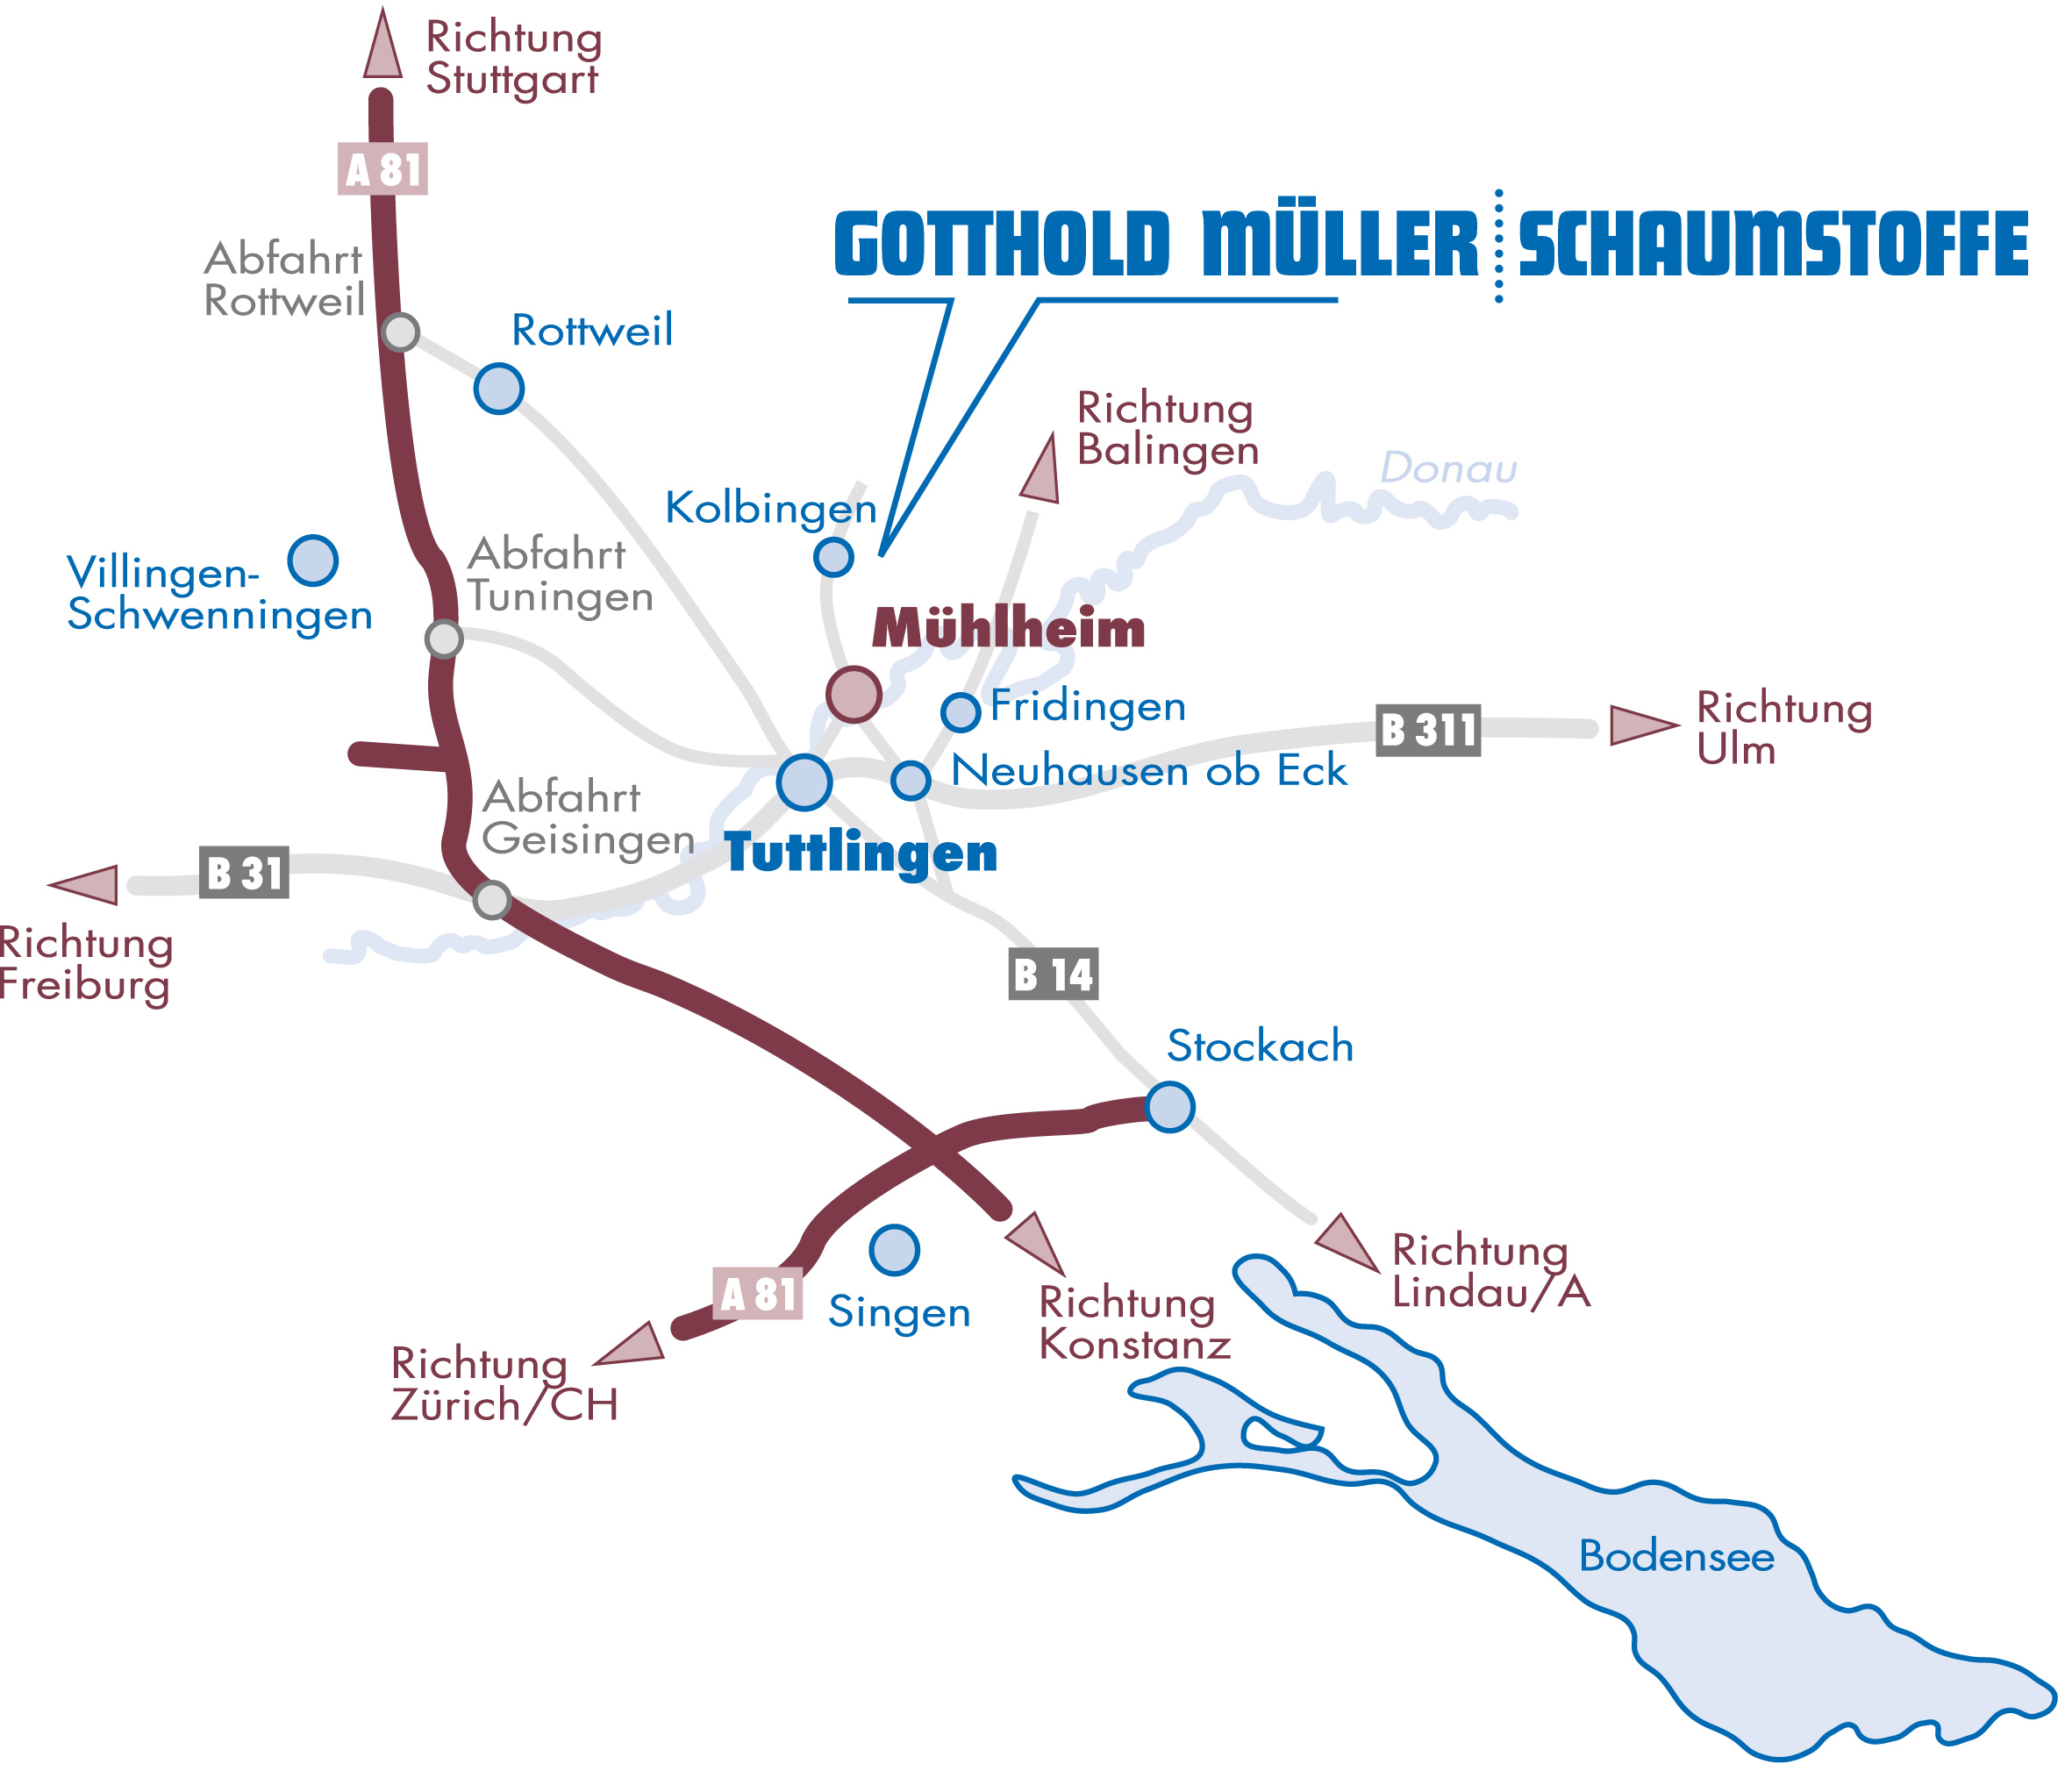 Standort - Gotthold Müller Schaumstoffe